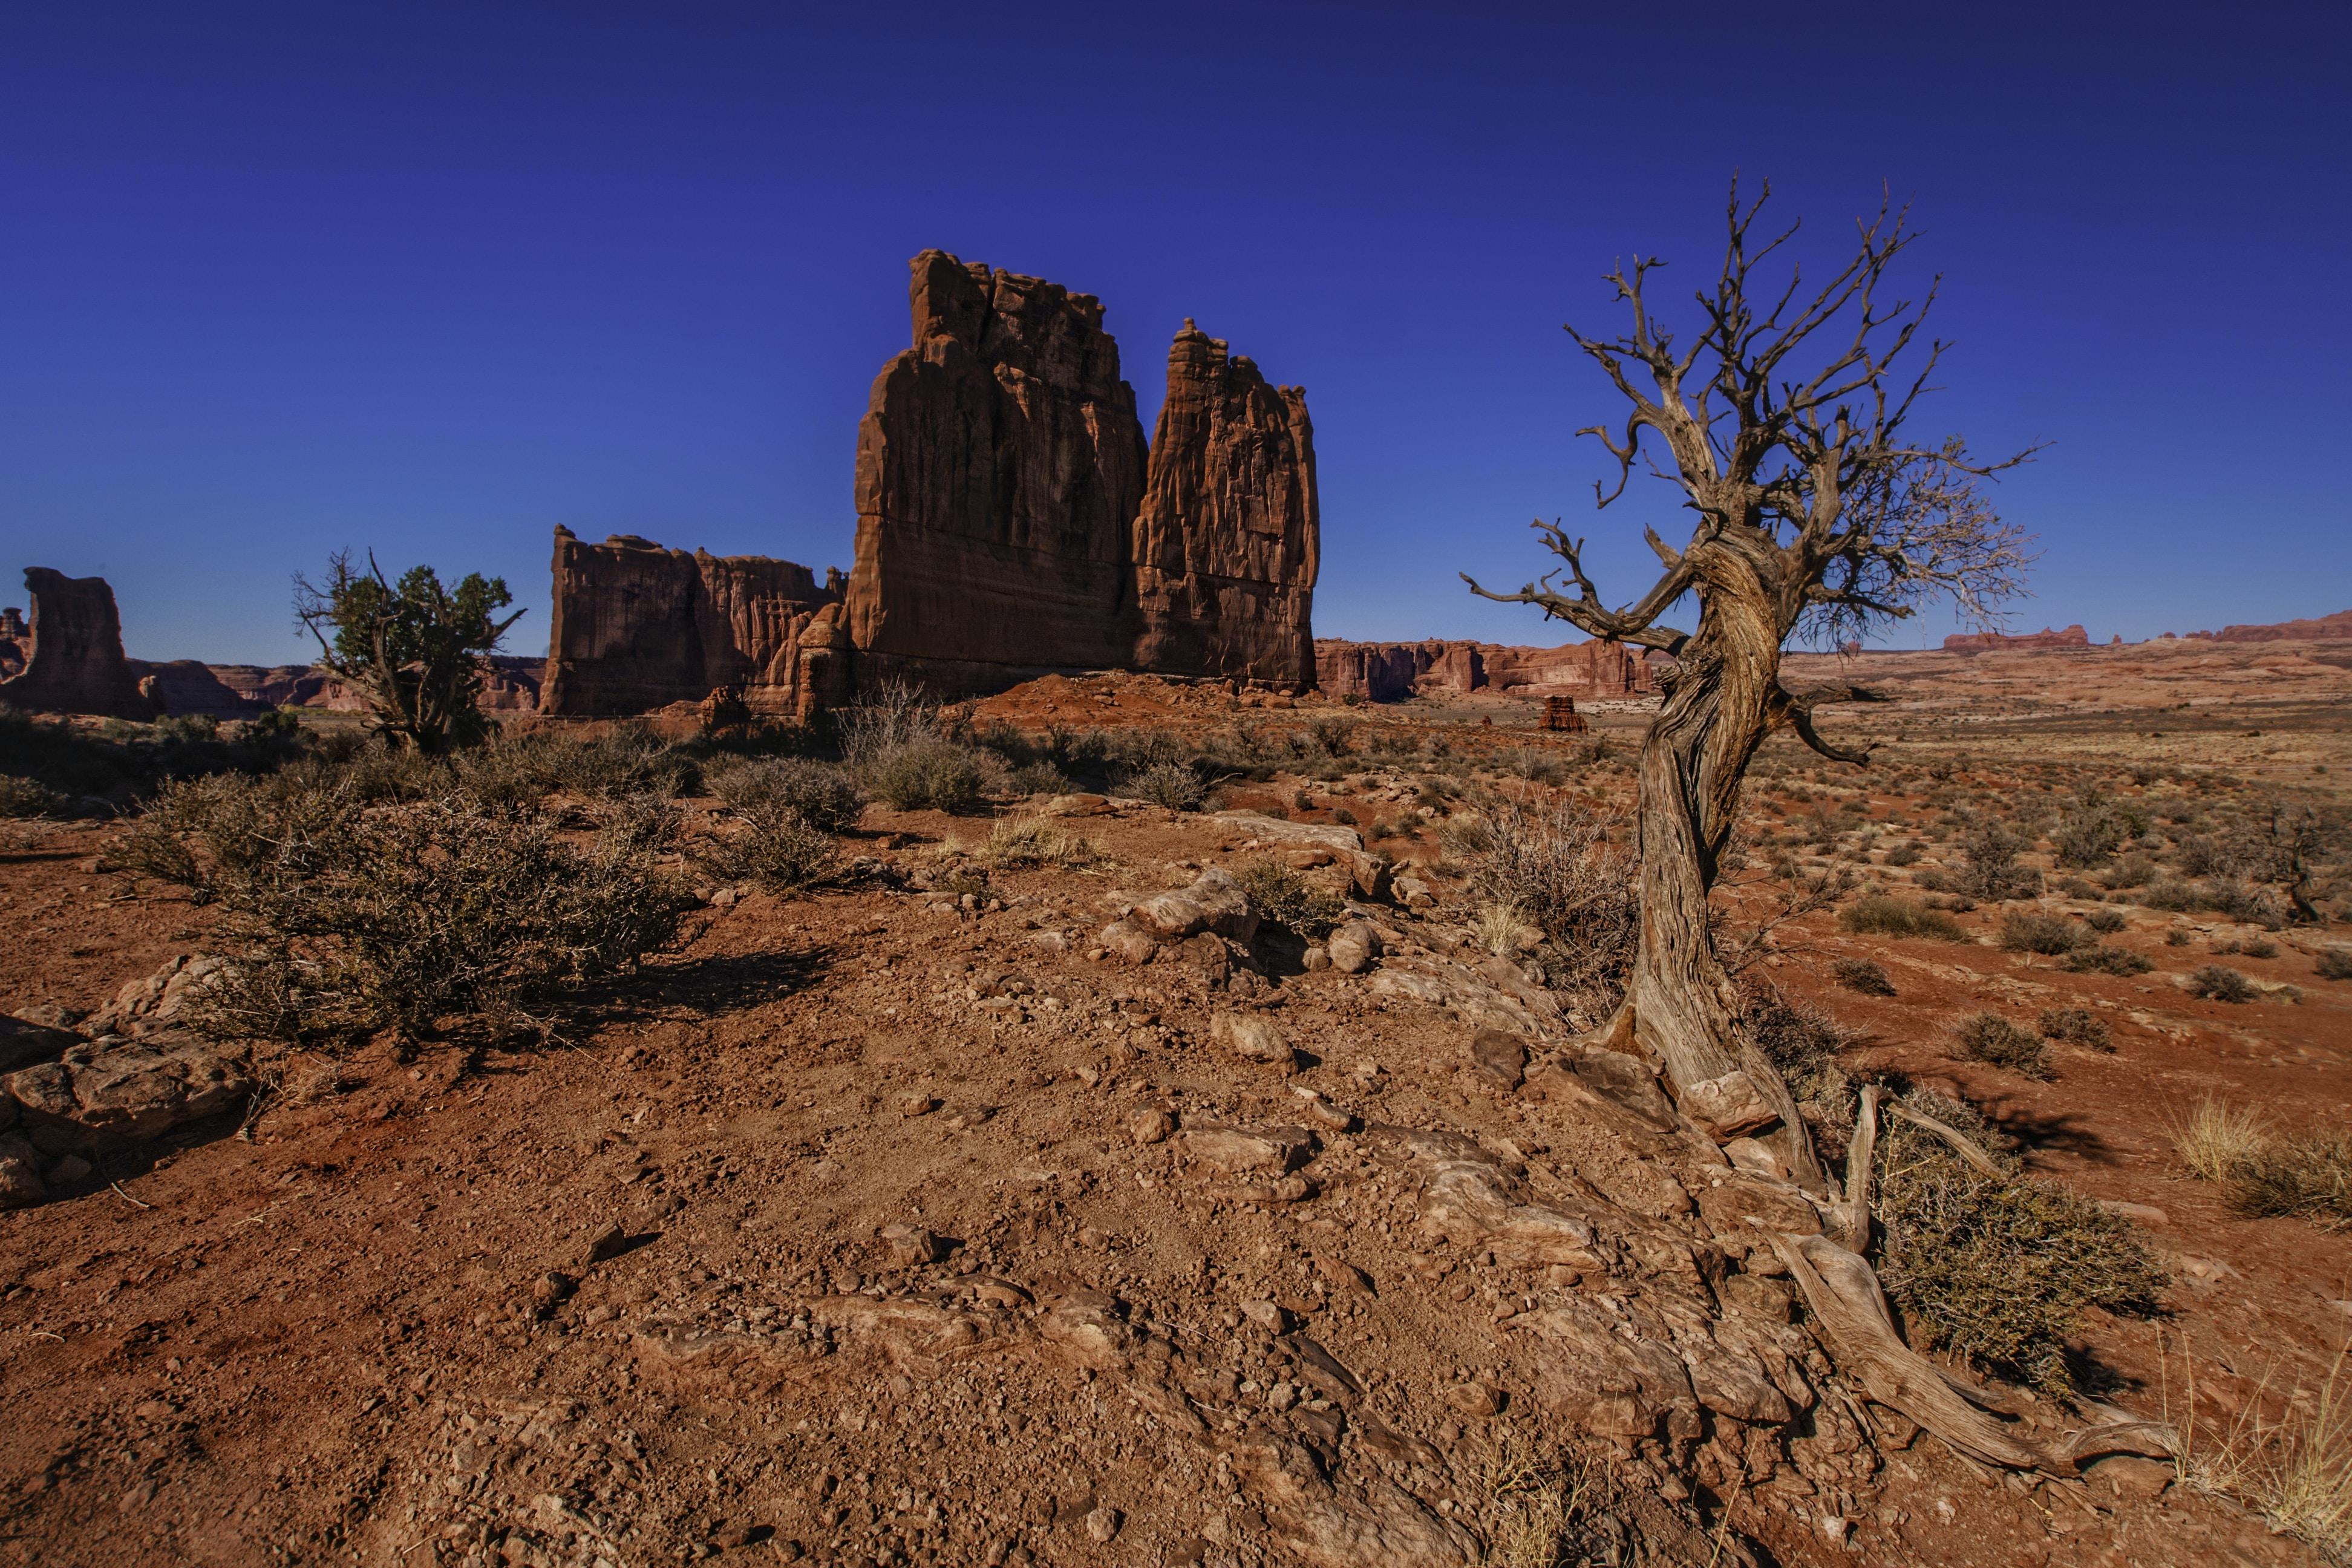 base tree near rock under blue sky at daytime